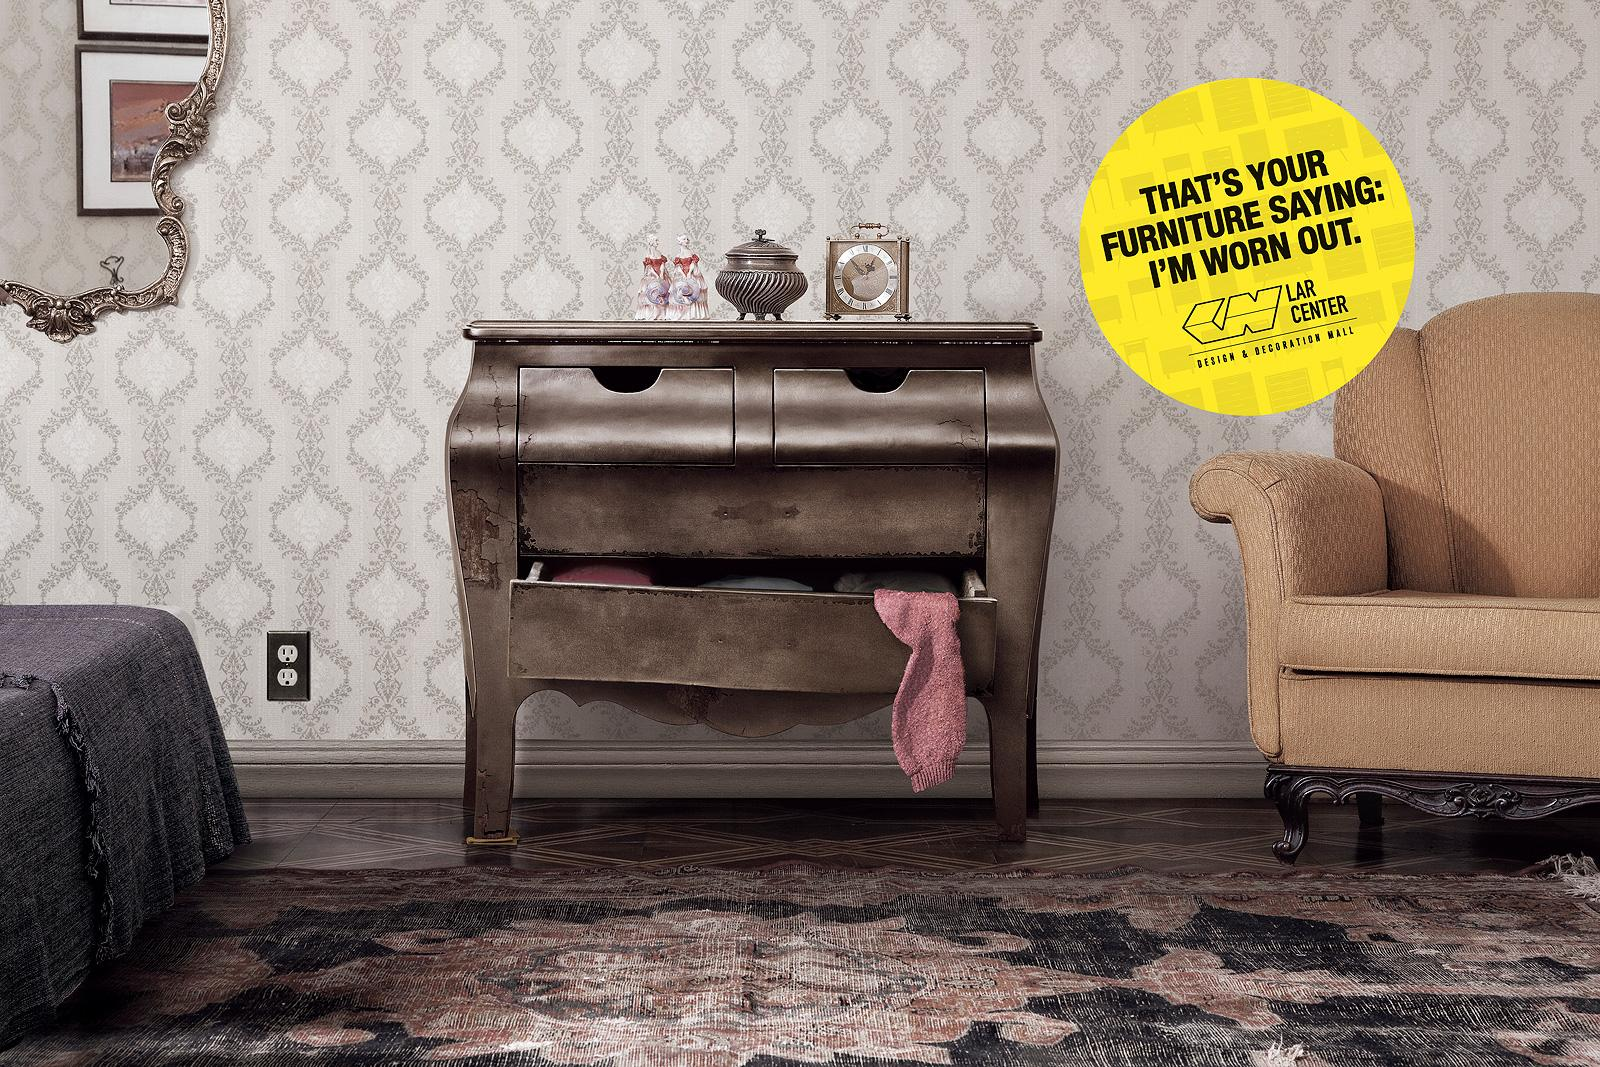 Lar Center Print Ad -  Tired Furniture, 2